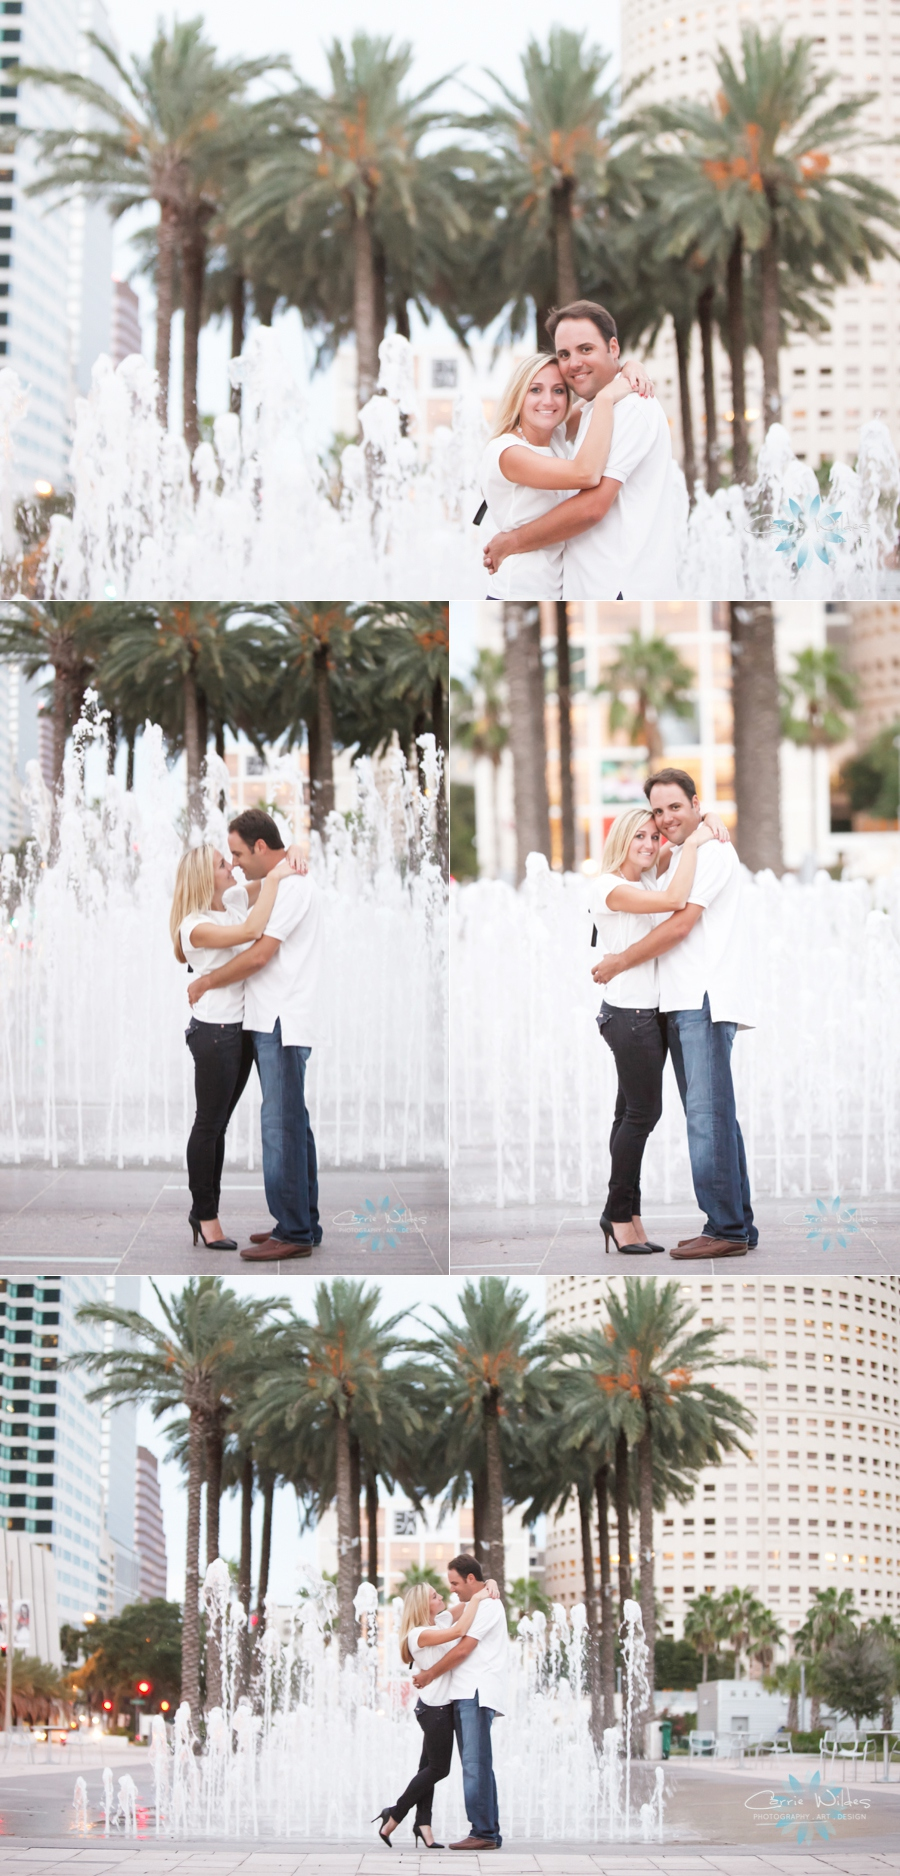 8_21_13 Bayshore Tampa Curtis Hixon Park Engagement_0004.jpg